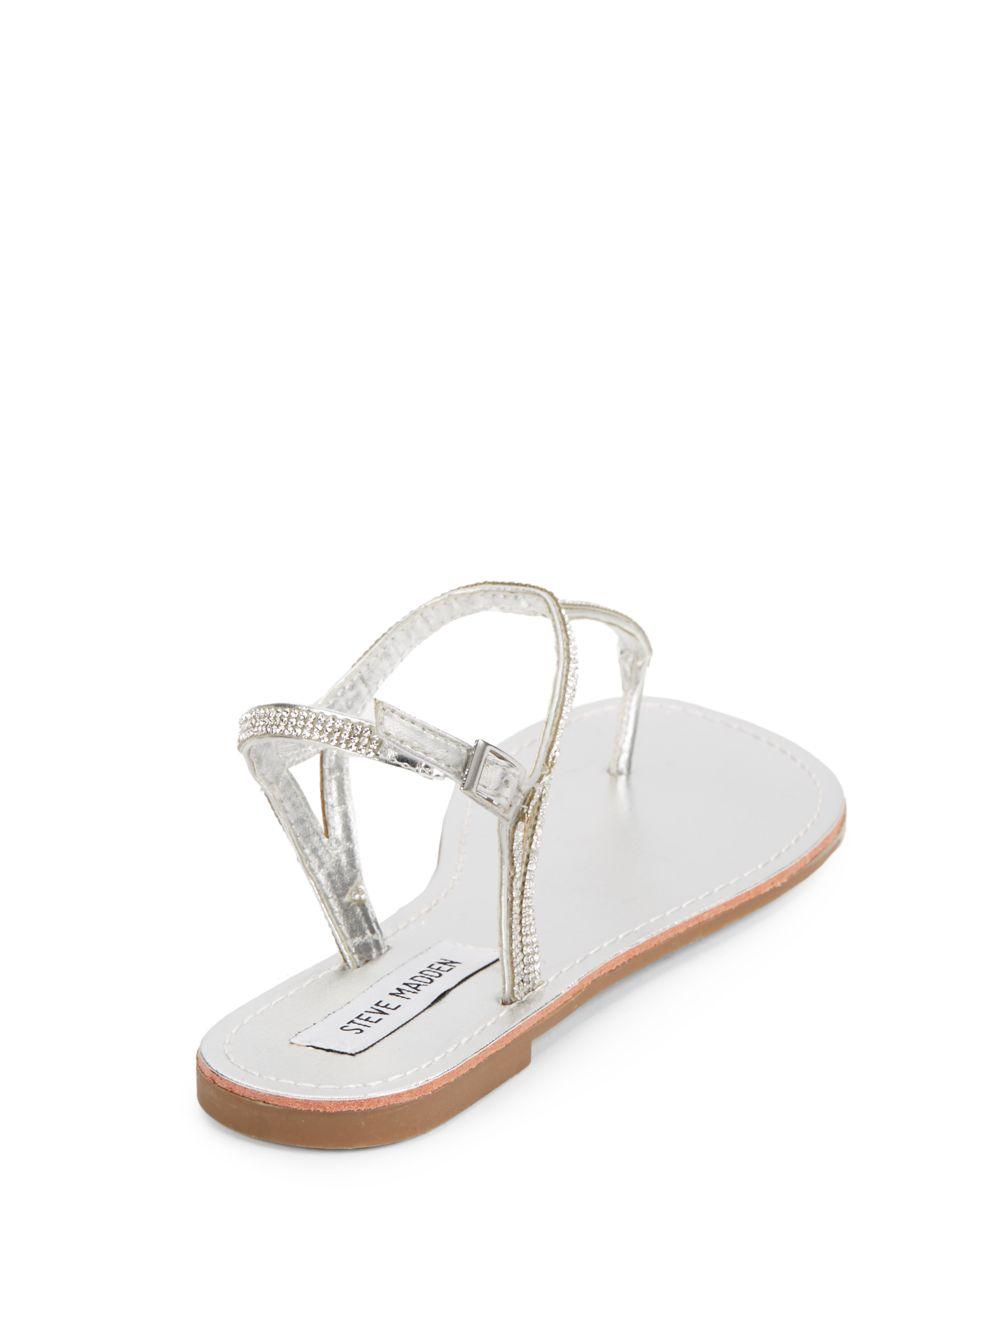 afe4a56190f Steve Madden Metallic Rhinestone Thong Sandals